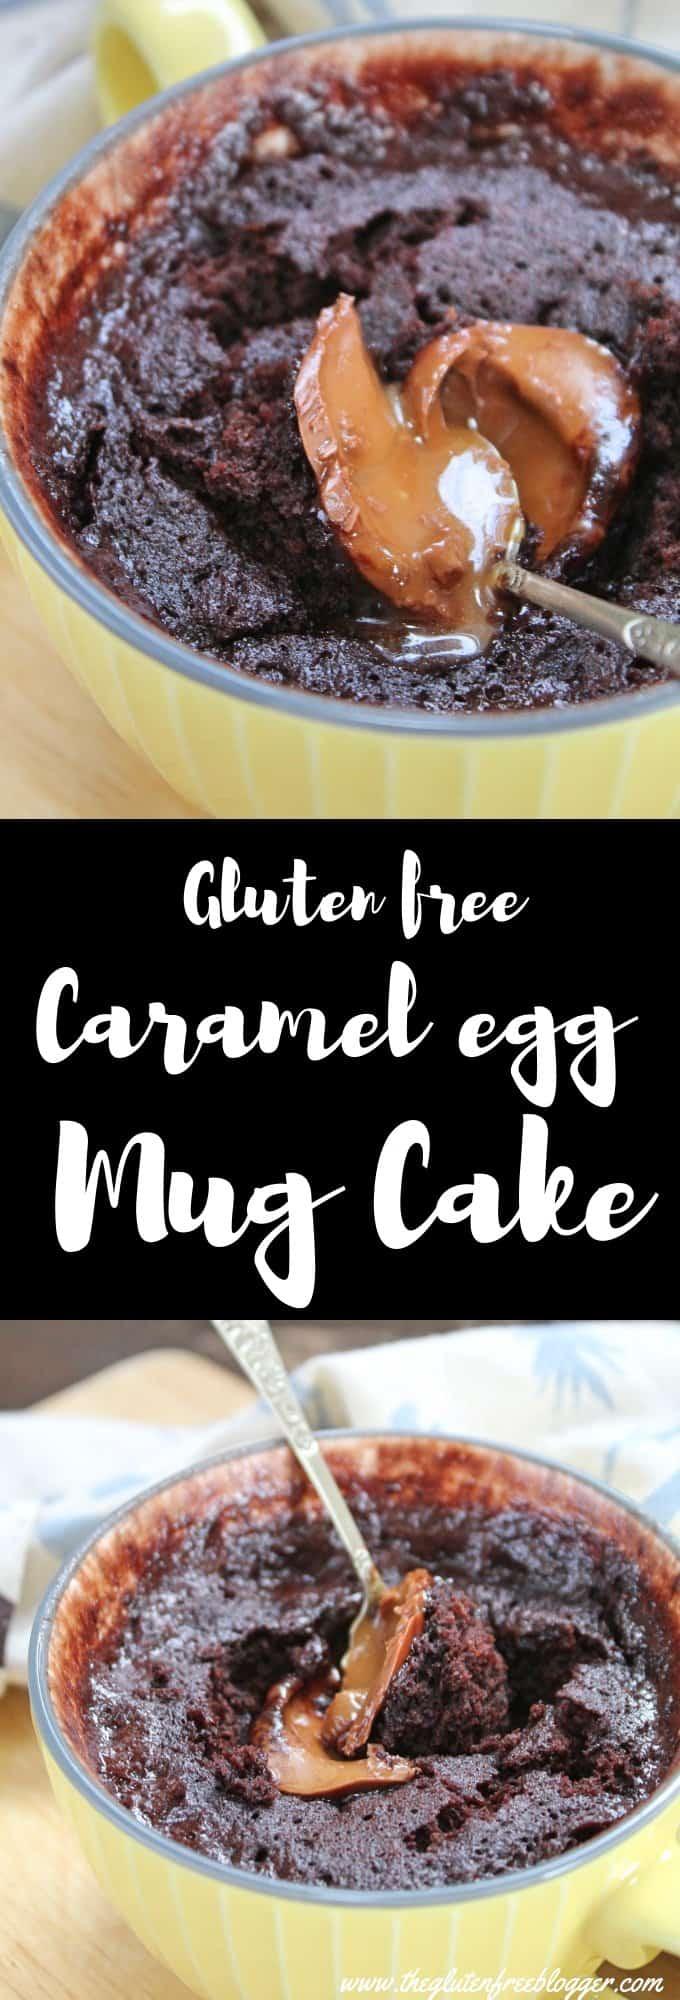 gluten free caramel egg mug cake recipe